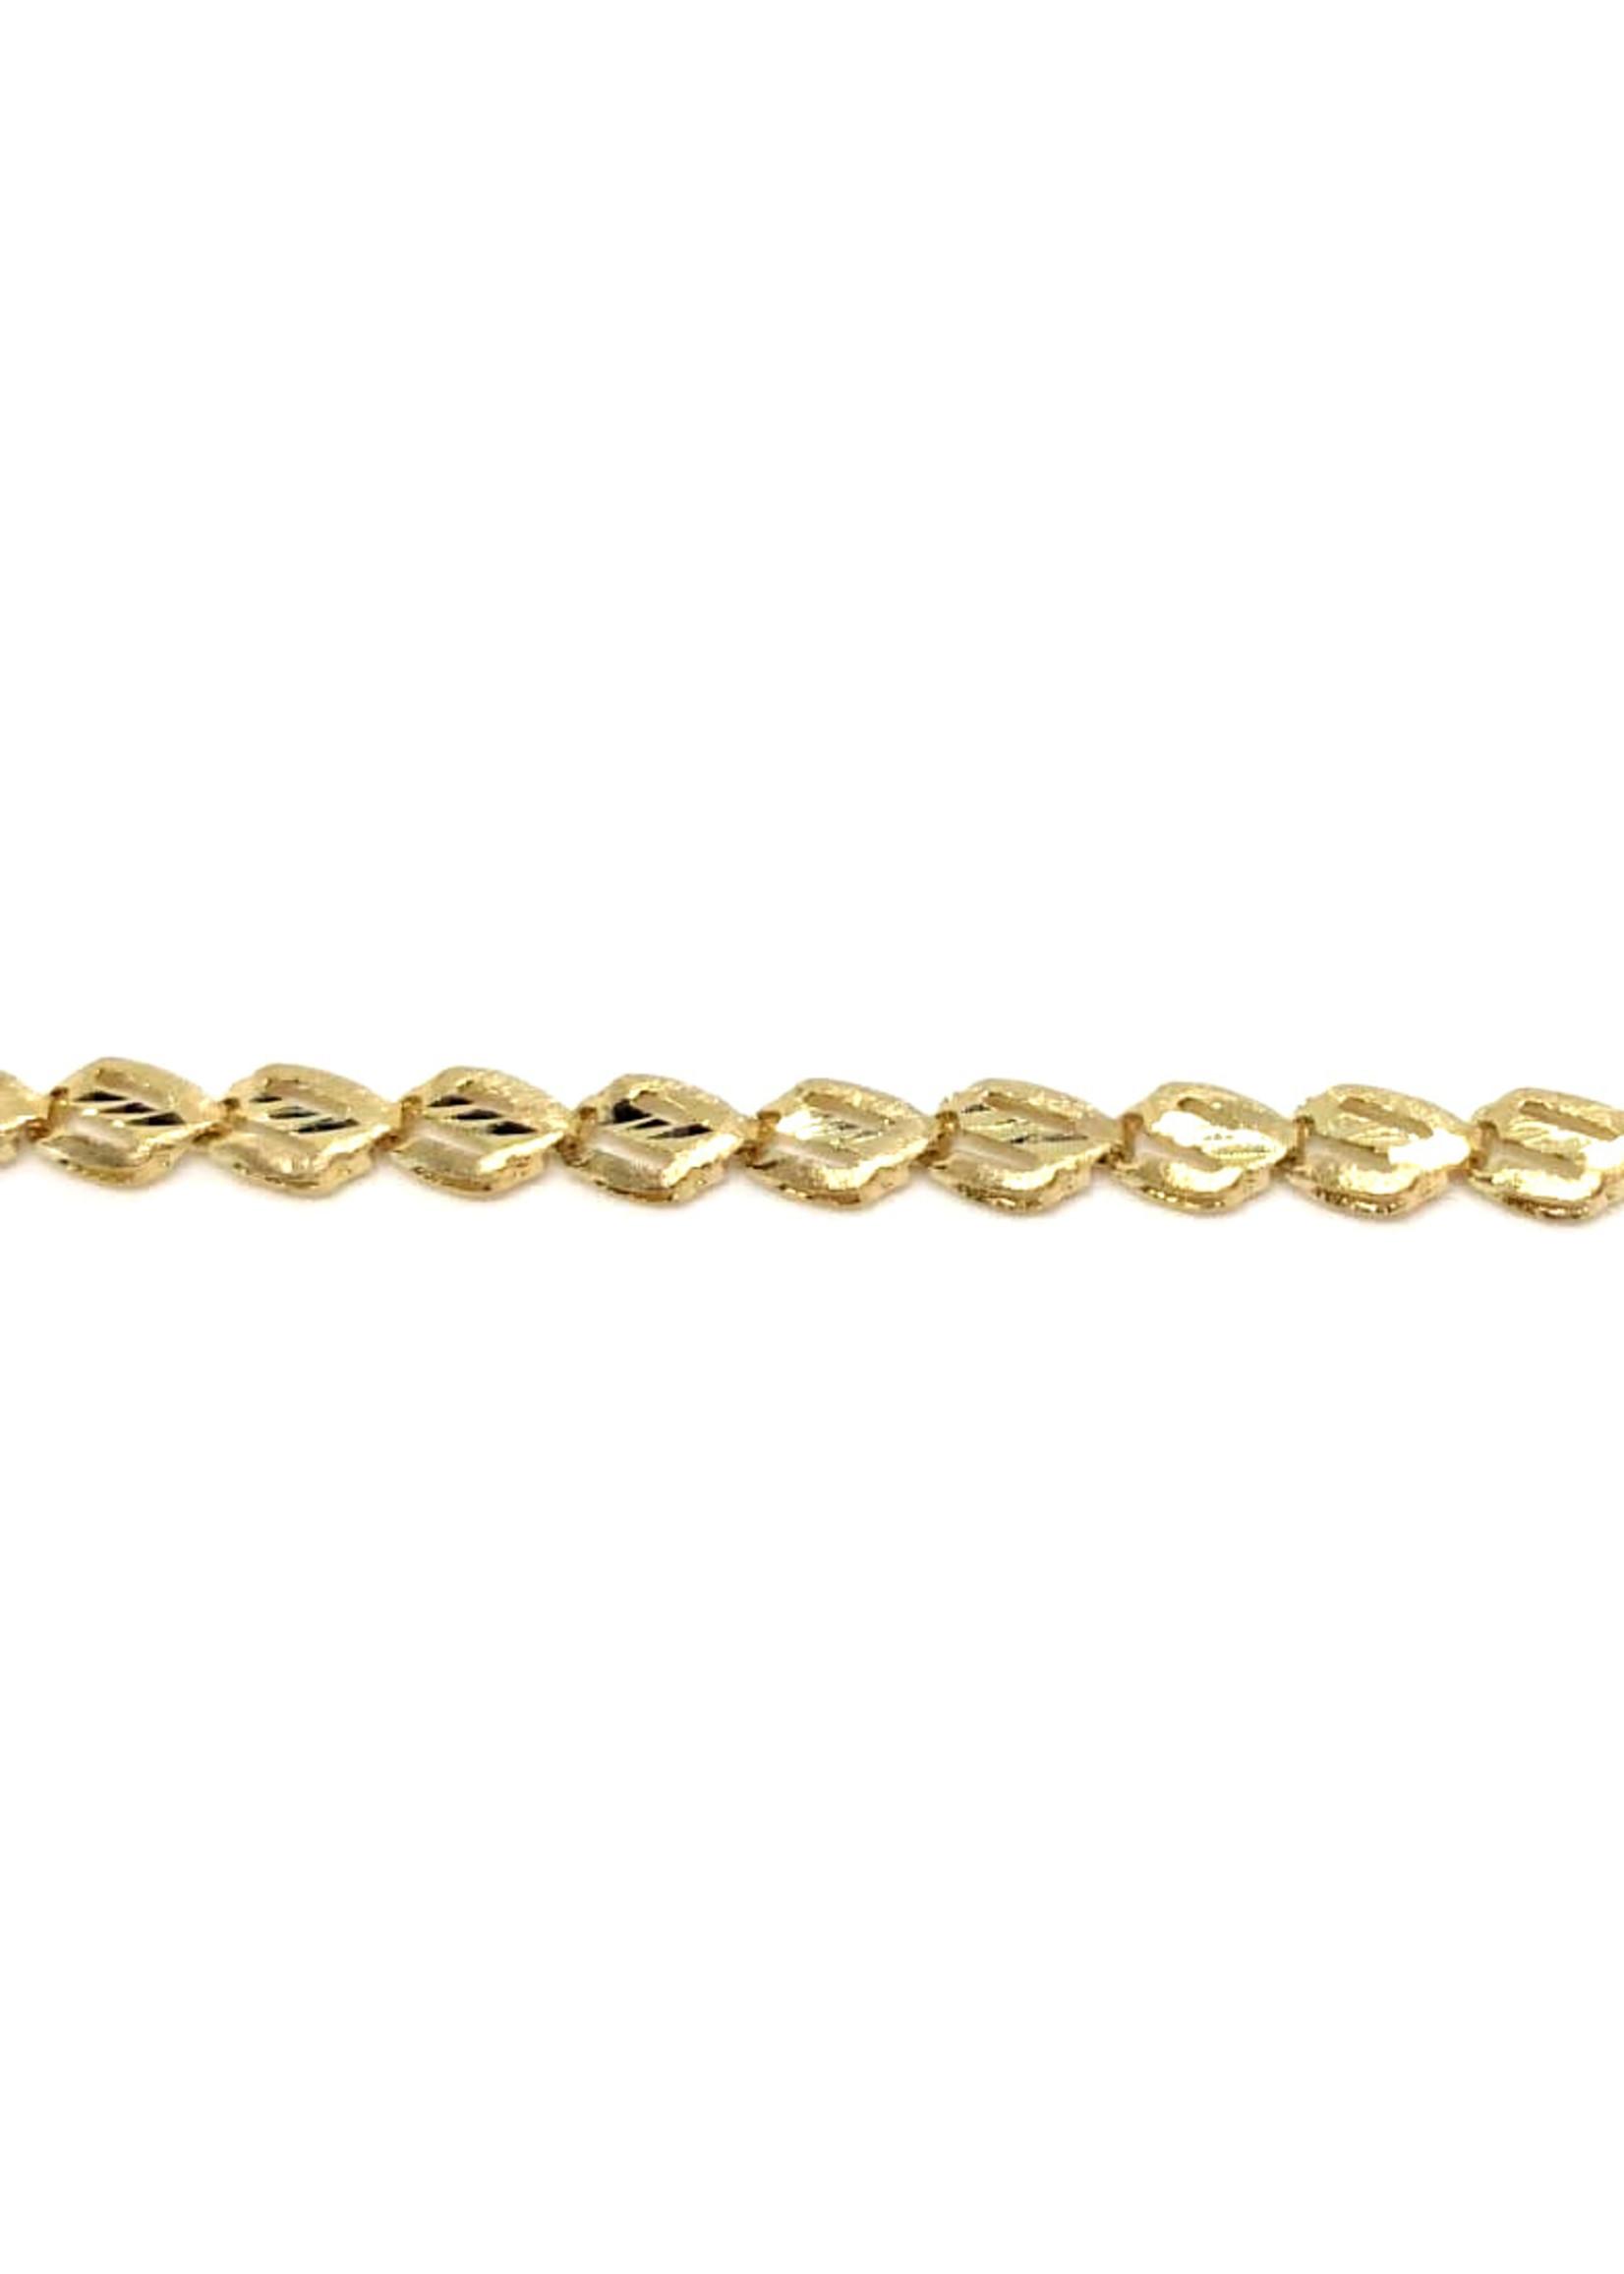 Bracelet Fantaisie Or 10K « diamond cut »